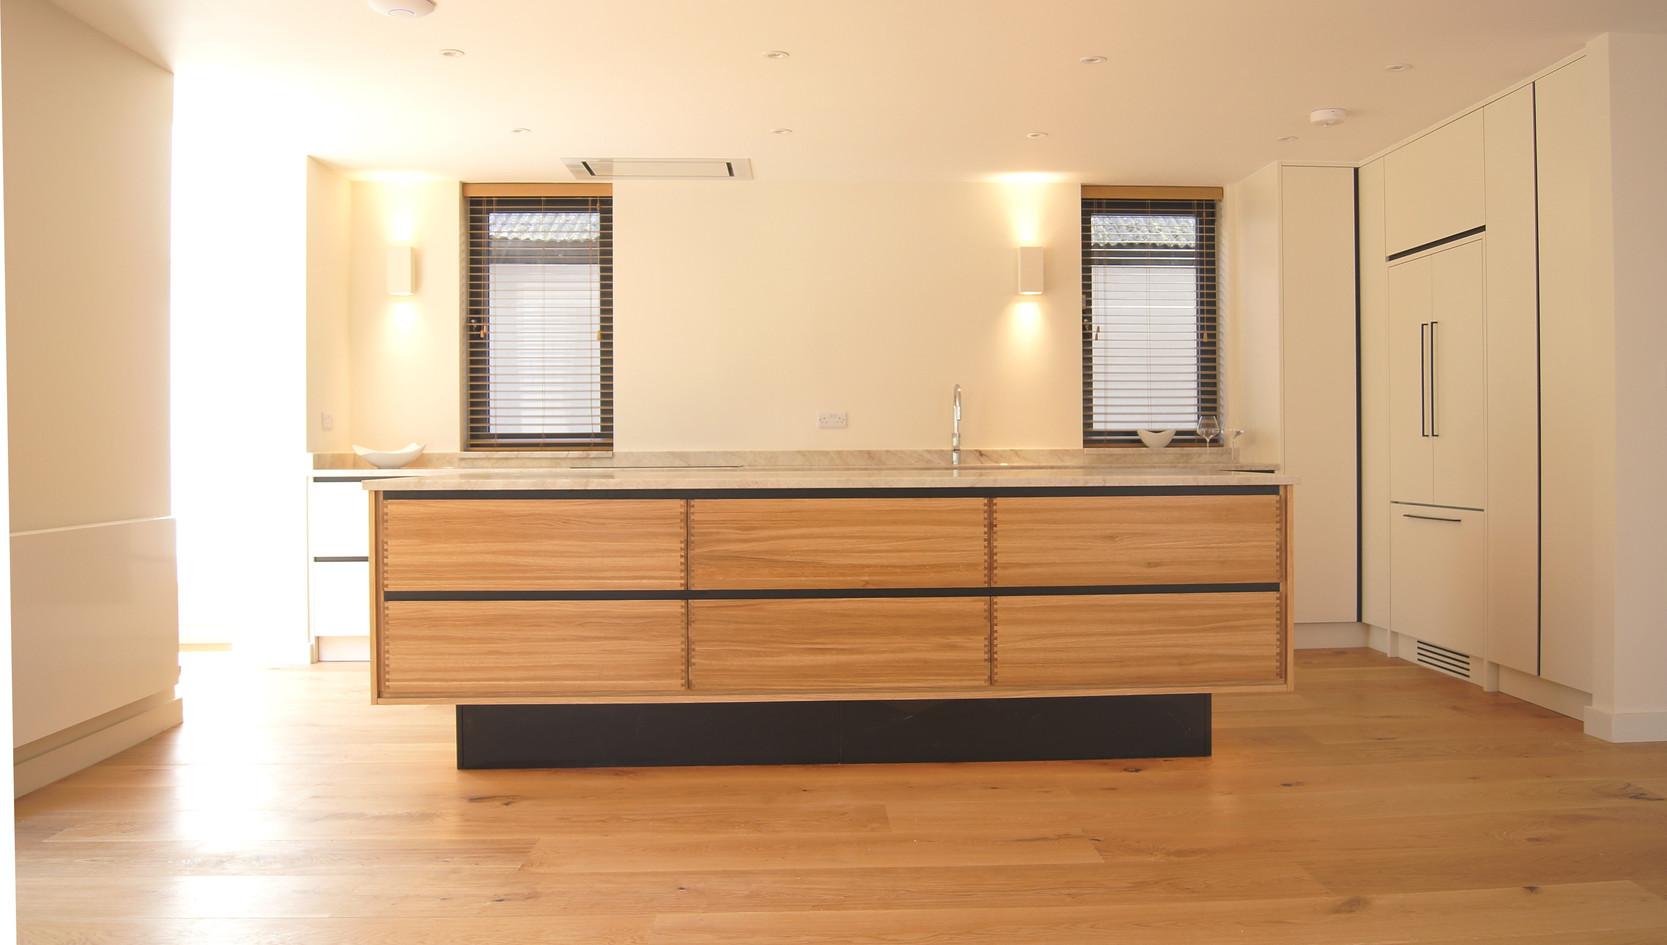 Bespoke kitchen. St Margarets